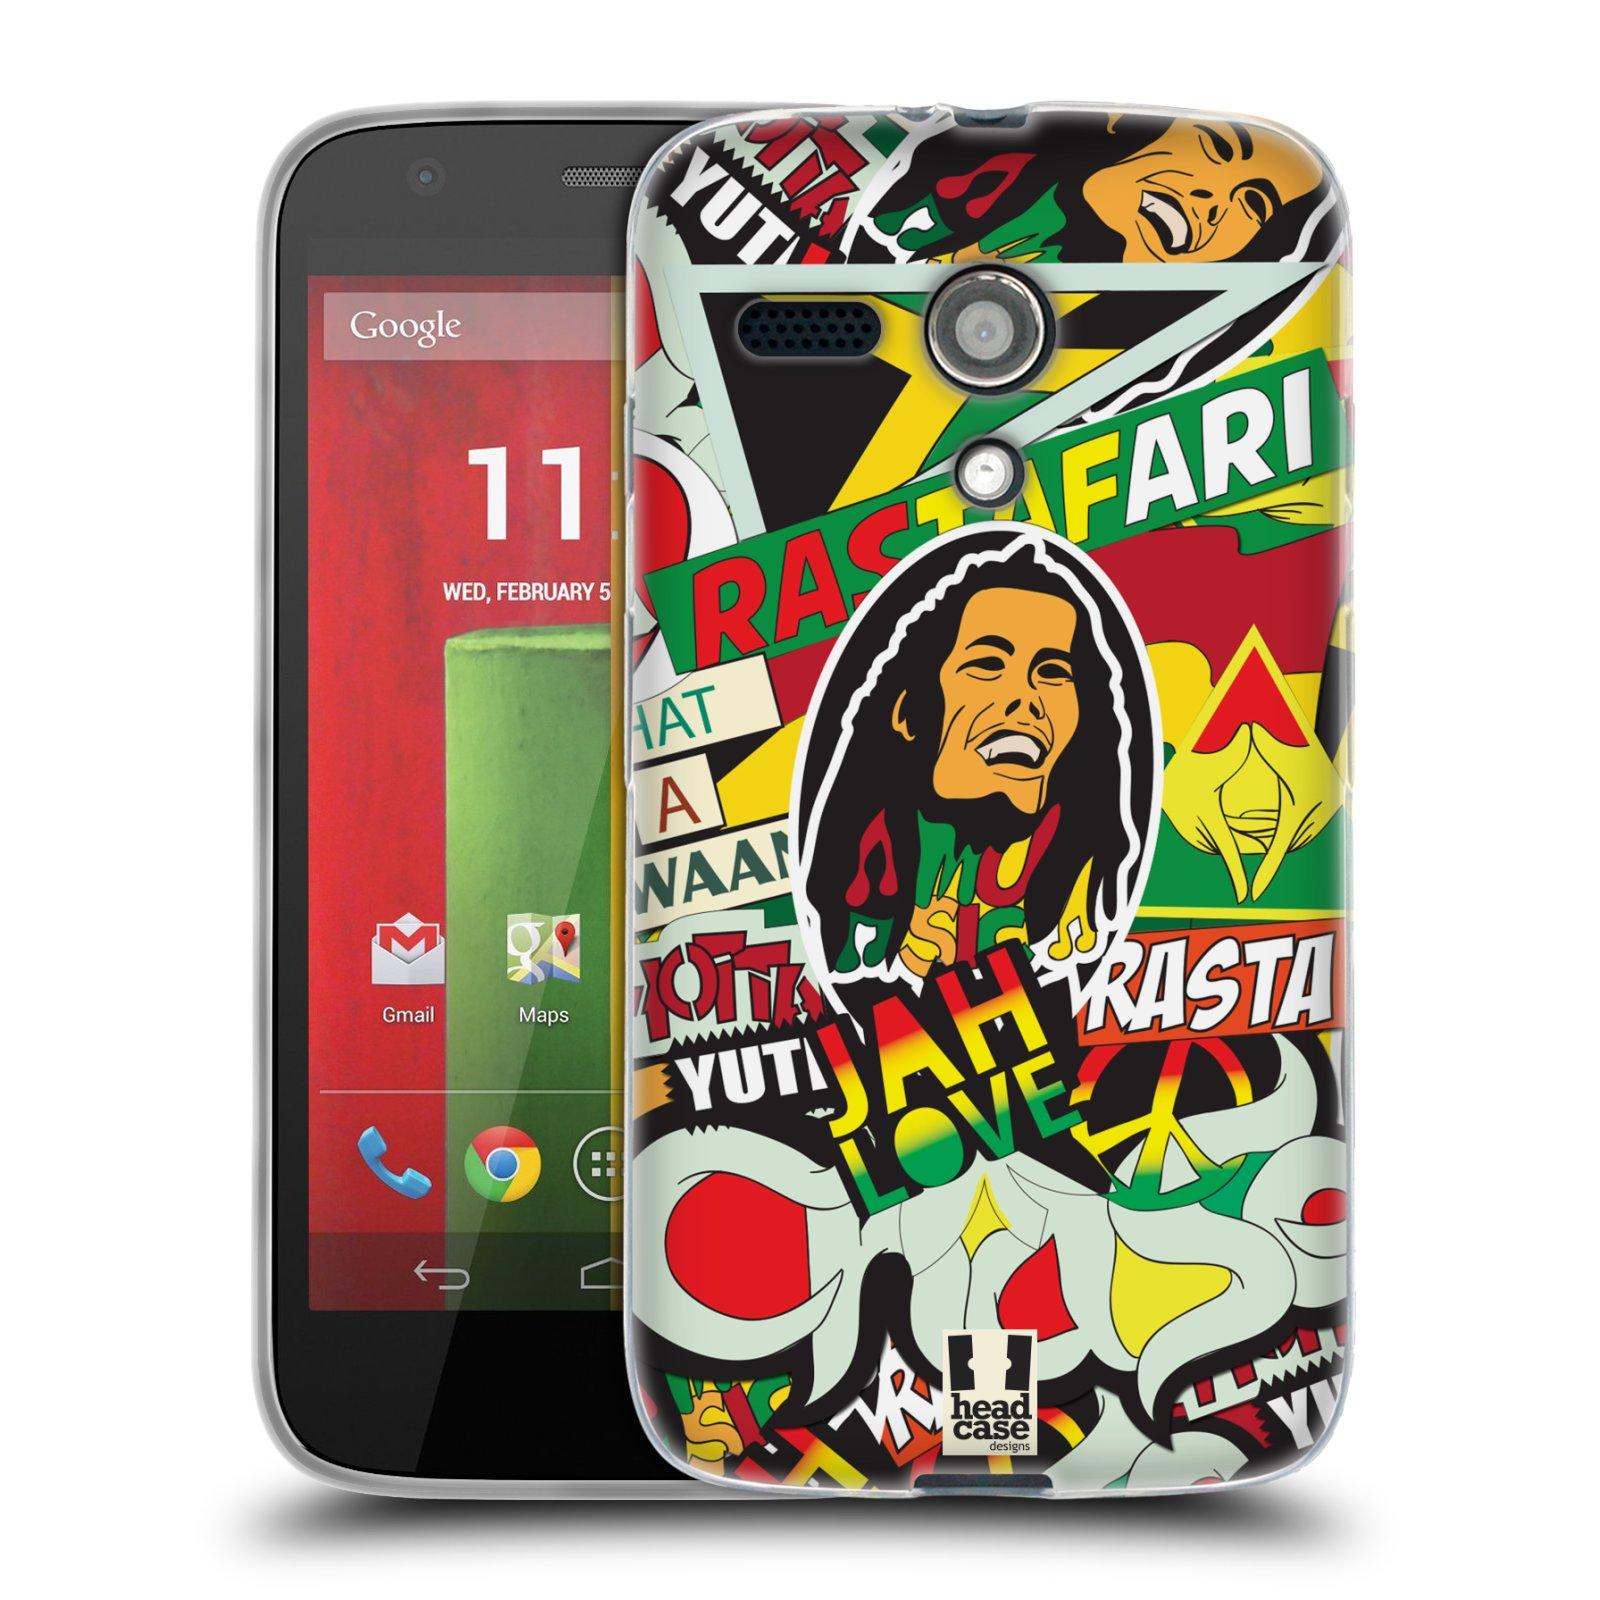 Silikonové pouzdro na mobil Motorola Moto G HEAD CASE RASTA (Silikonový kryt či obal na mobilní telefon Motorola Moto G)